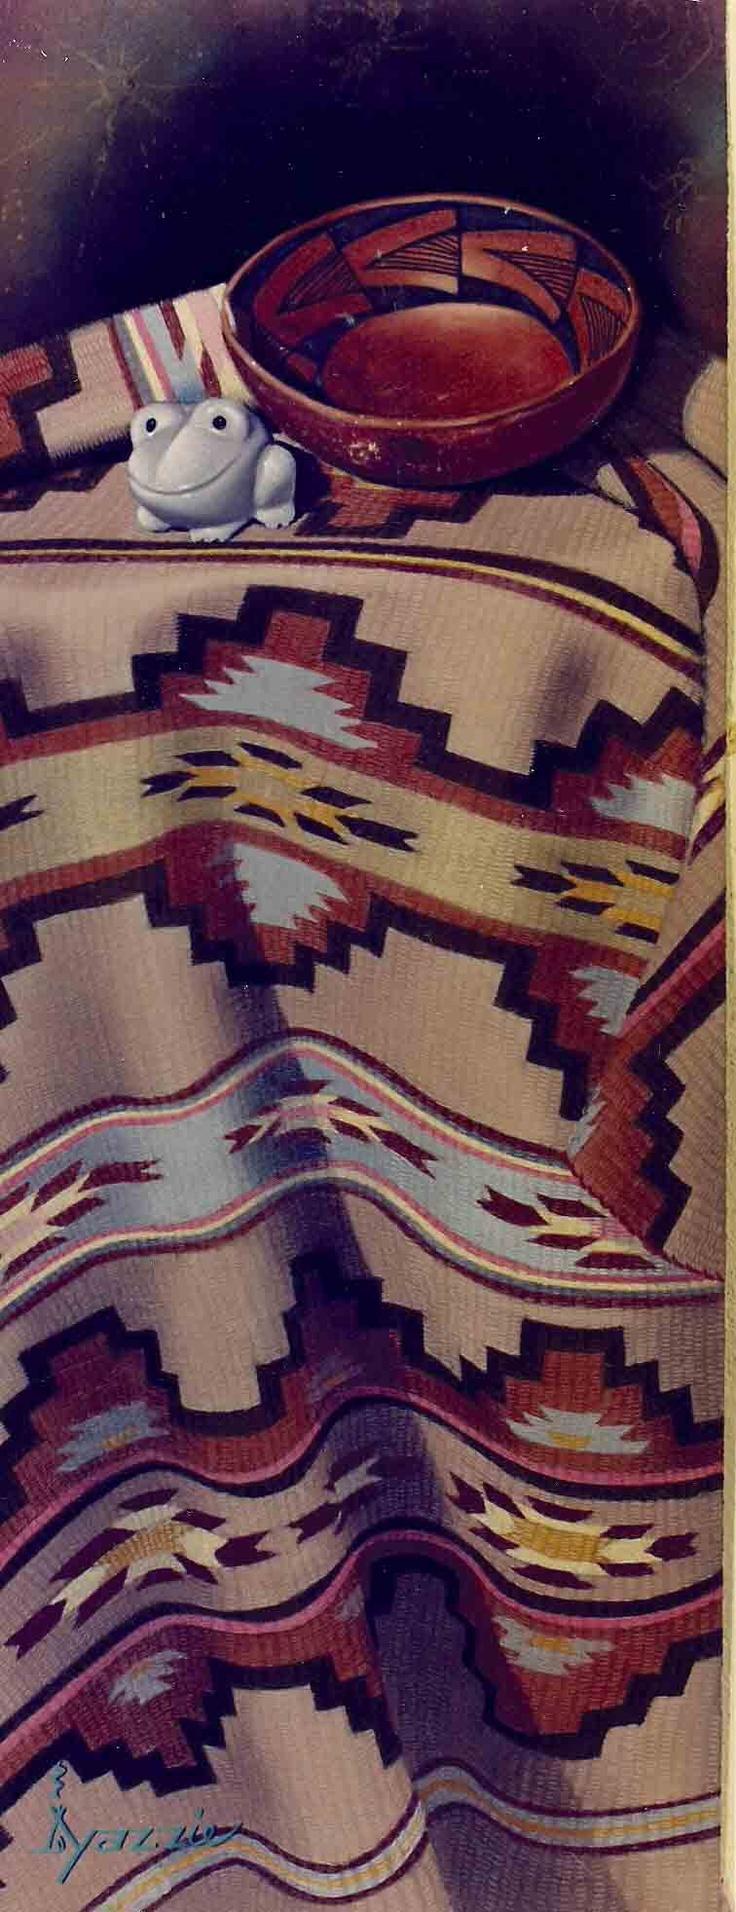 Navajo fetish symbols dirty little